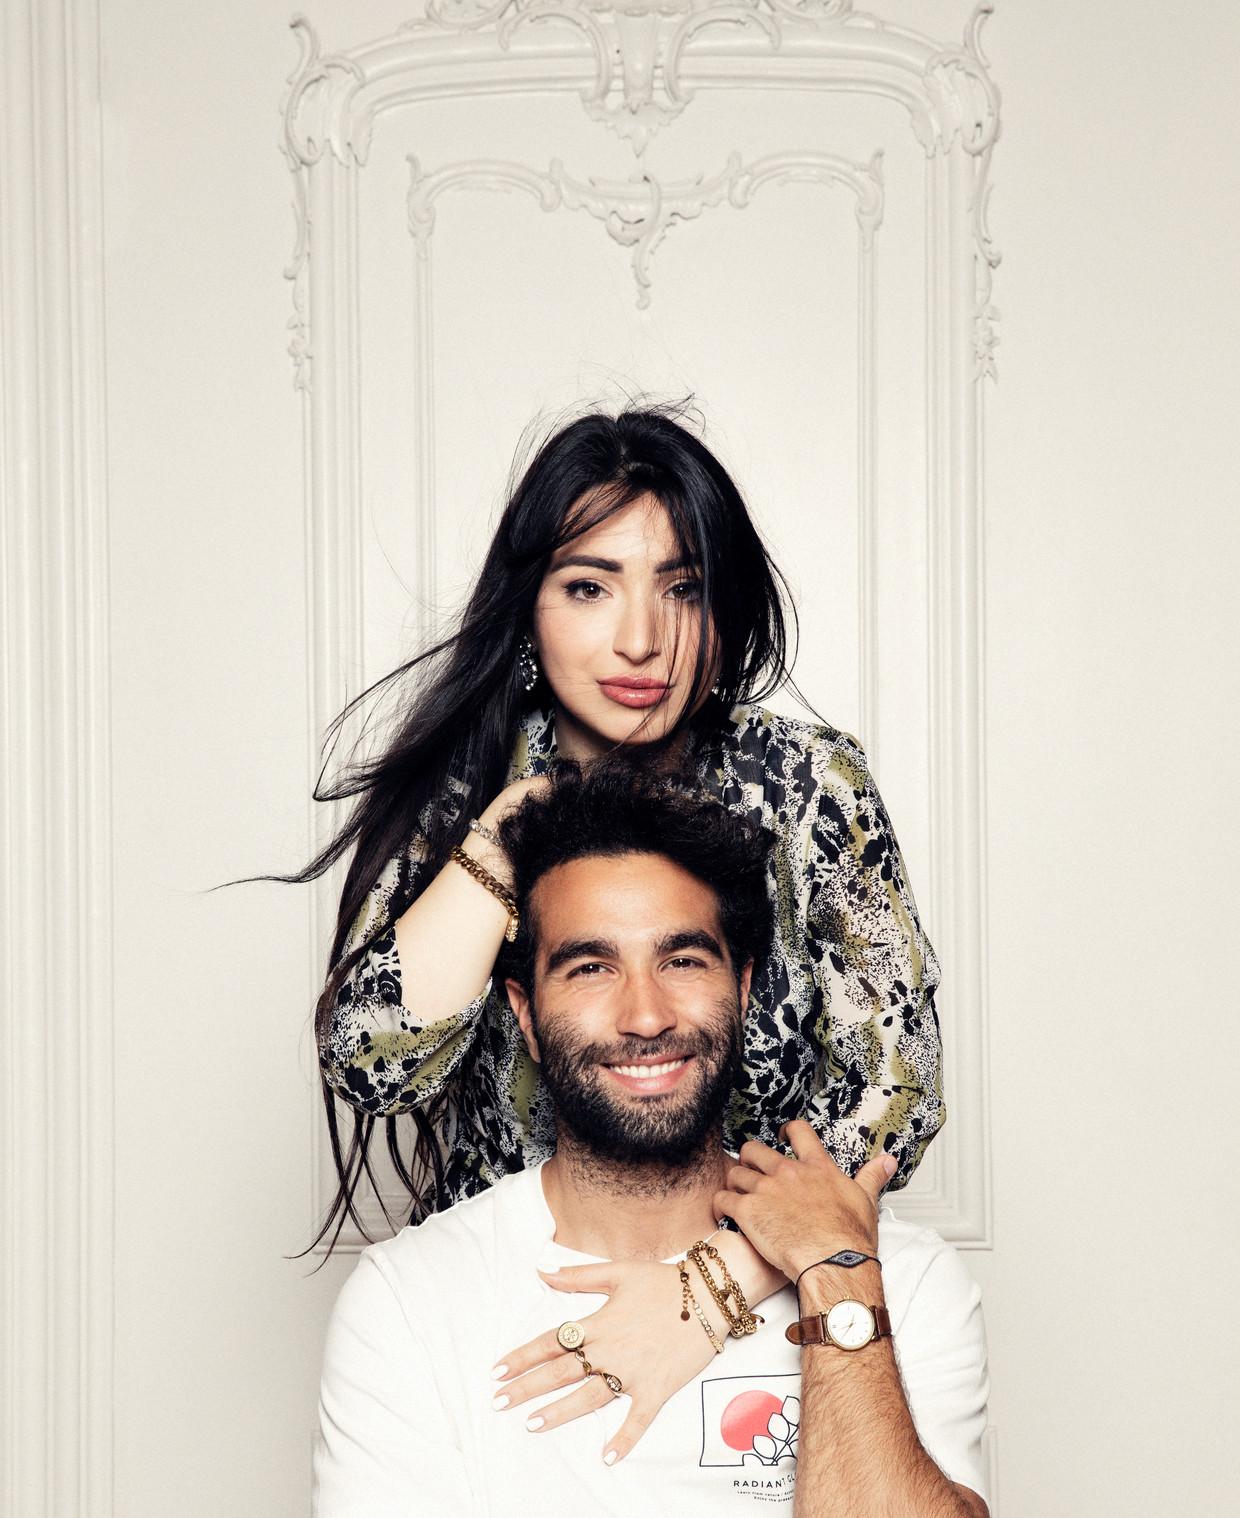 Lale Gül en Mano Bouzamour. Beeld Linda Stulic